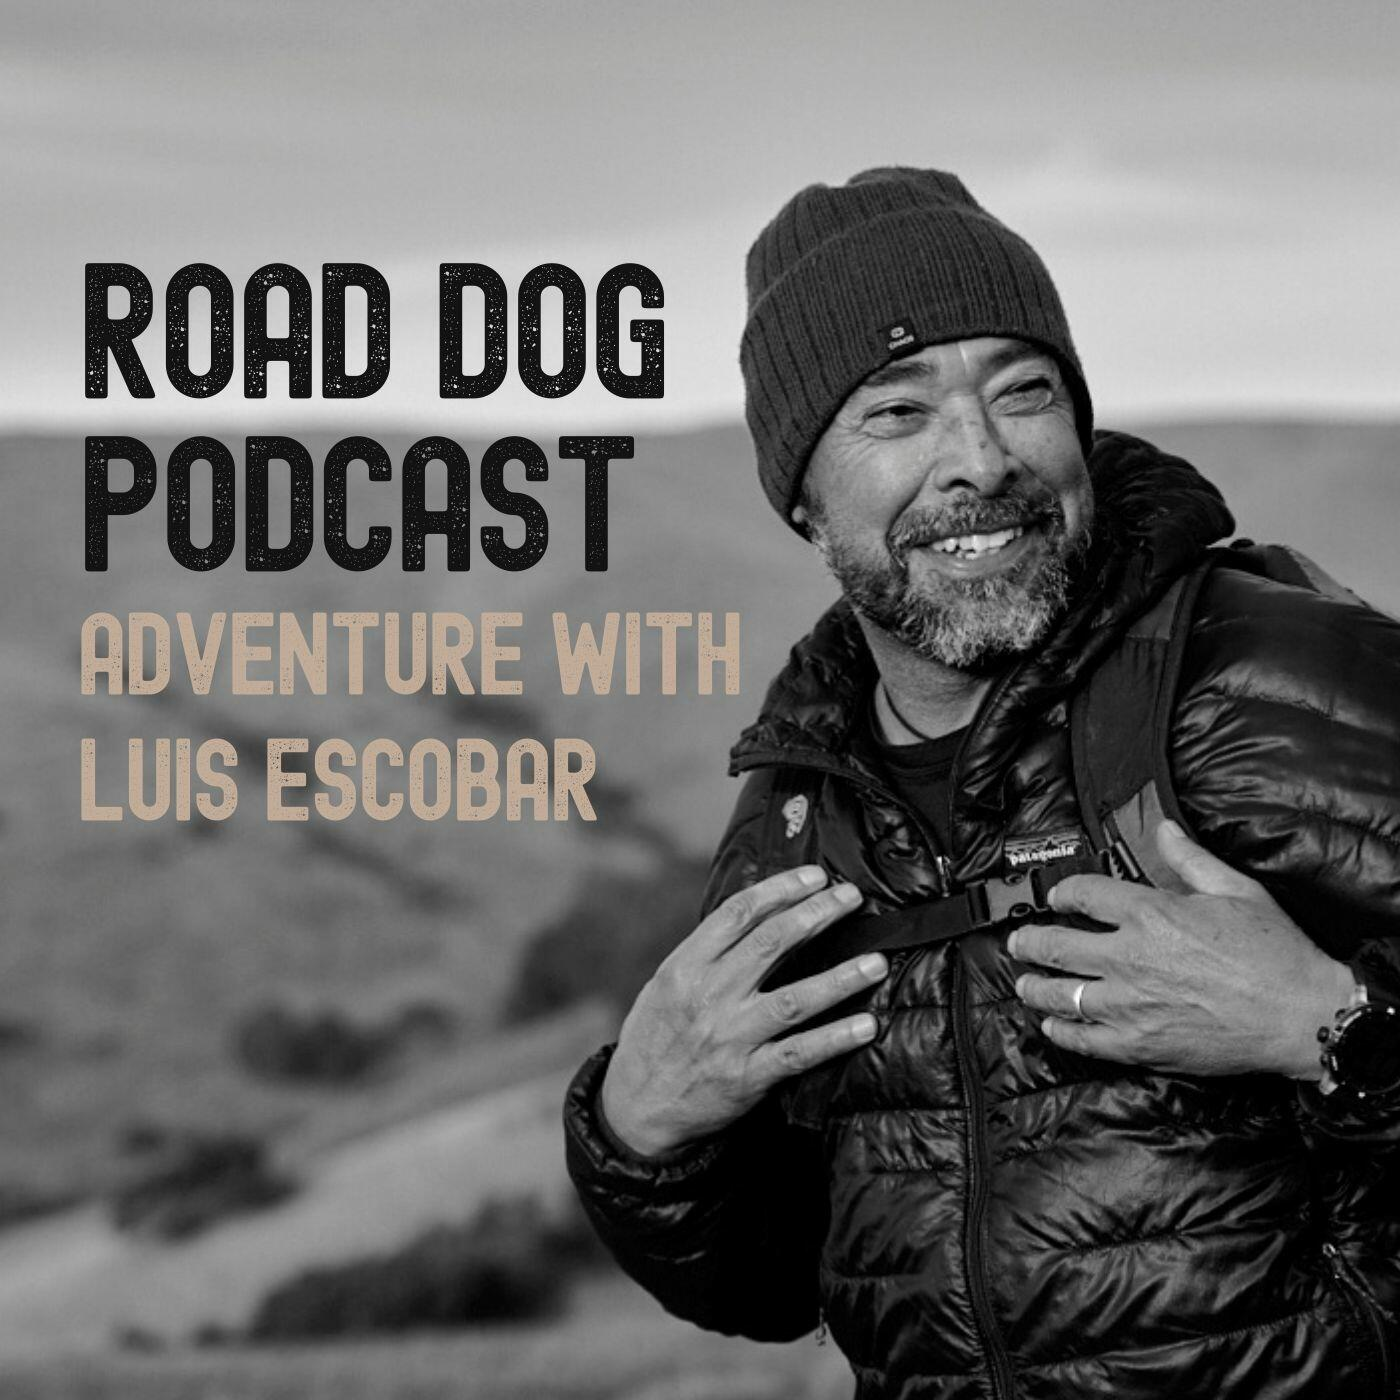 Road Dog Podcast